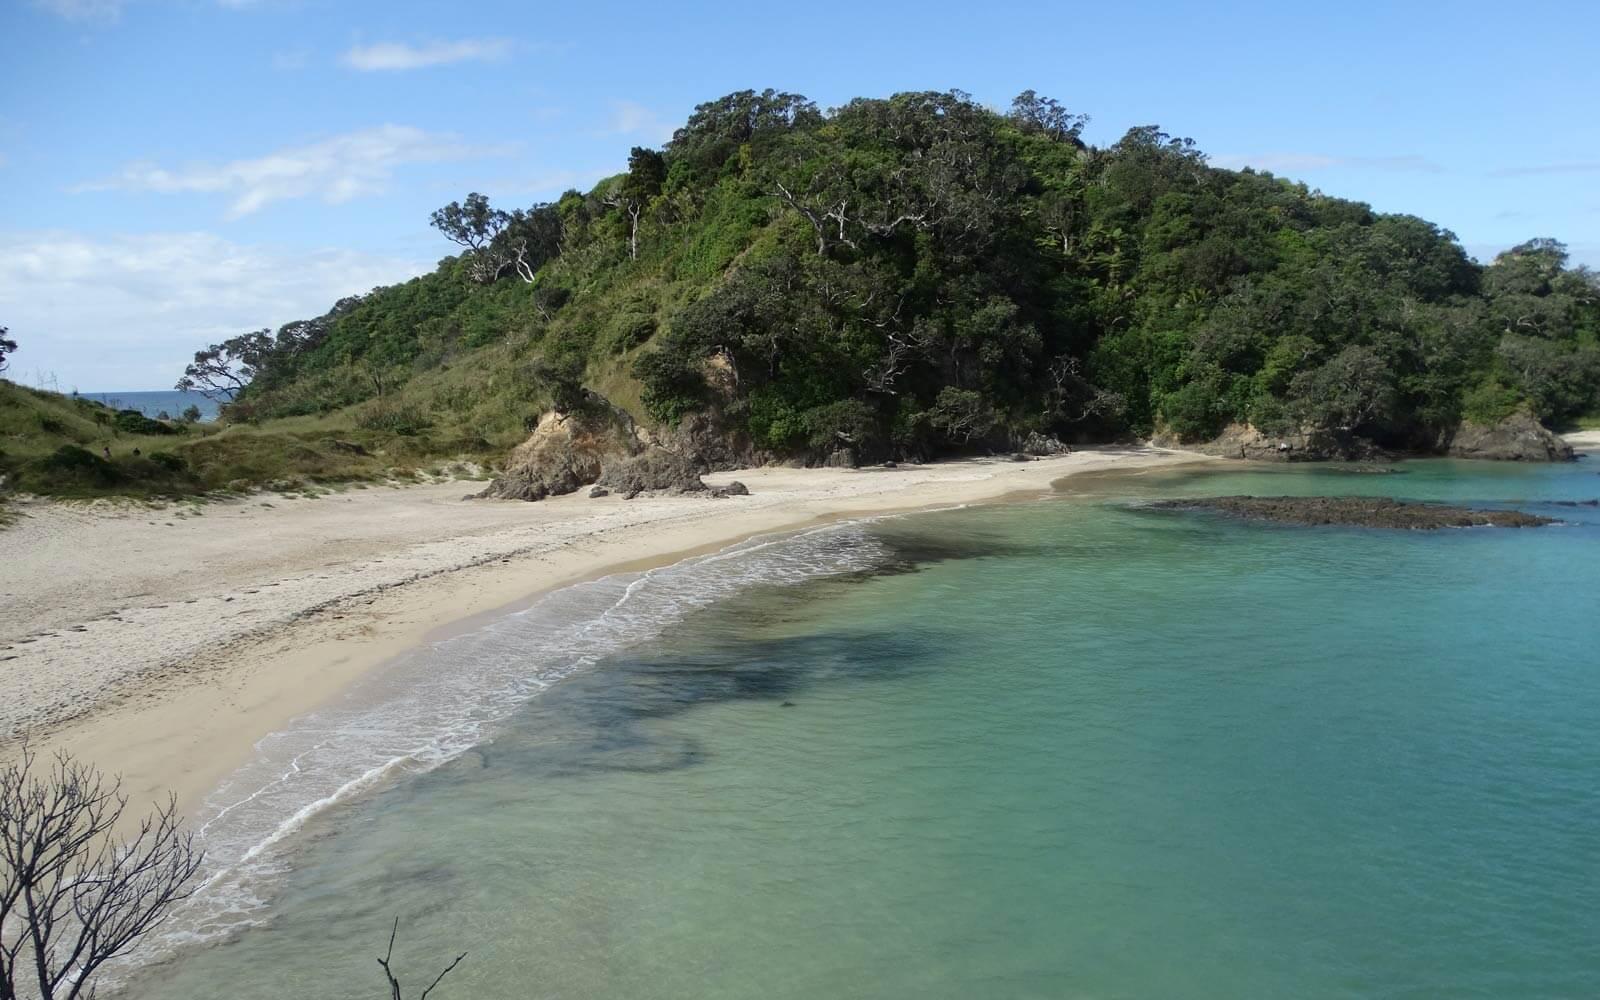 Kaituna Bay in Neuseeland